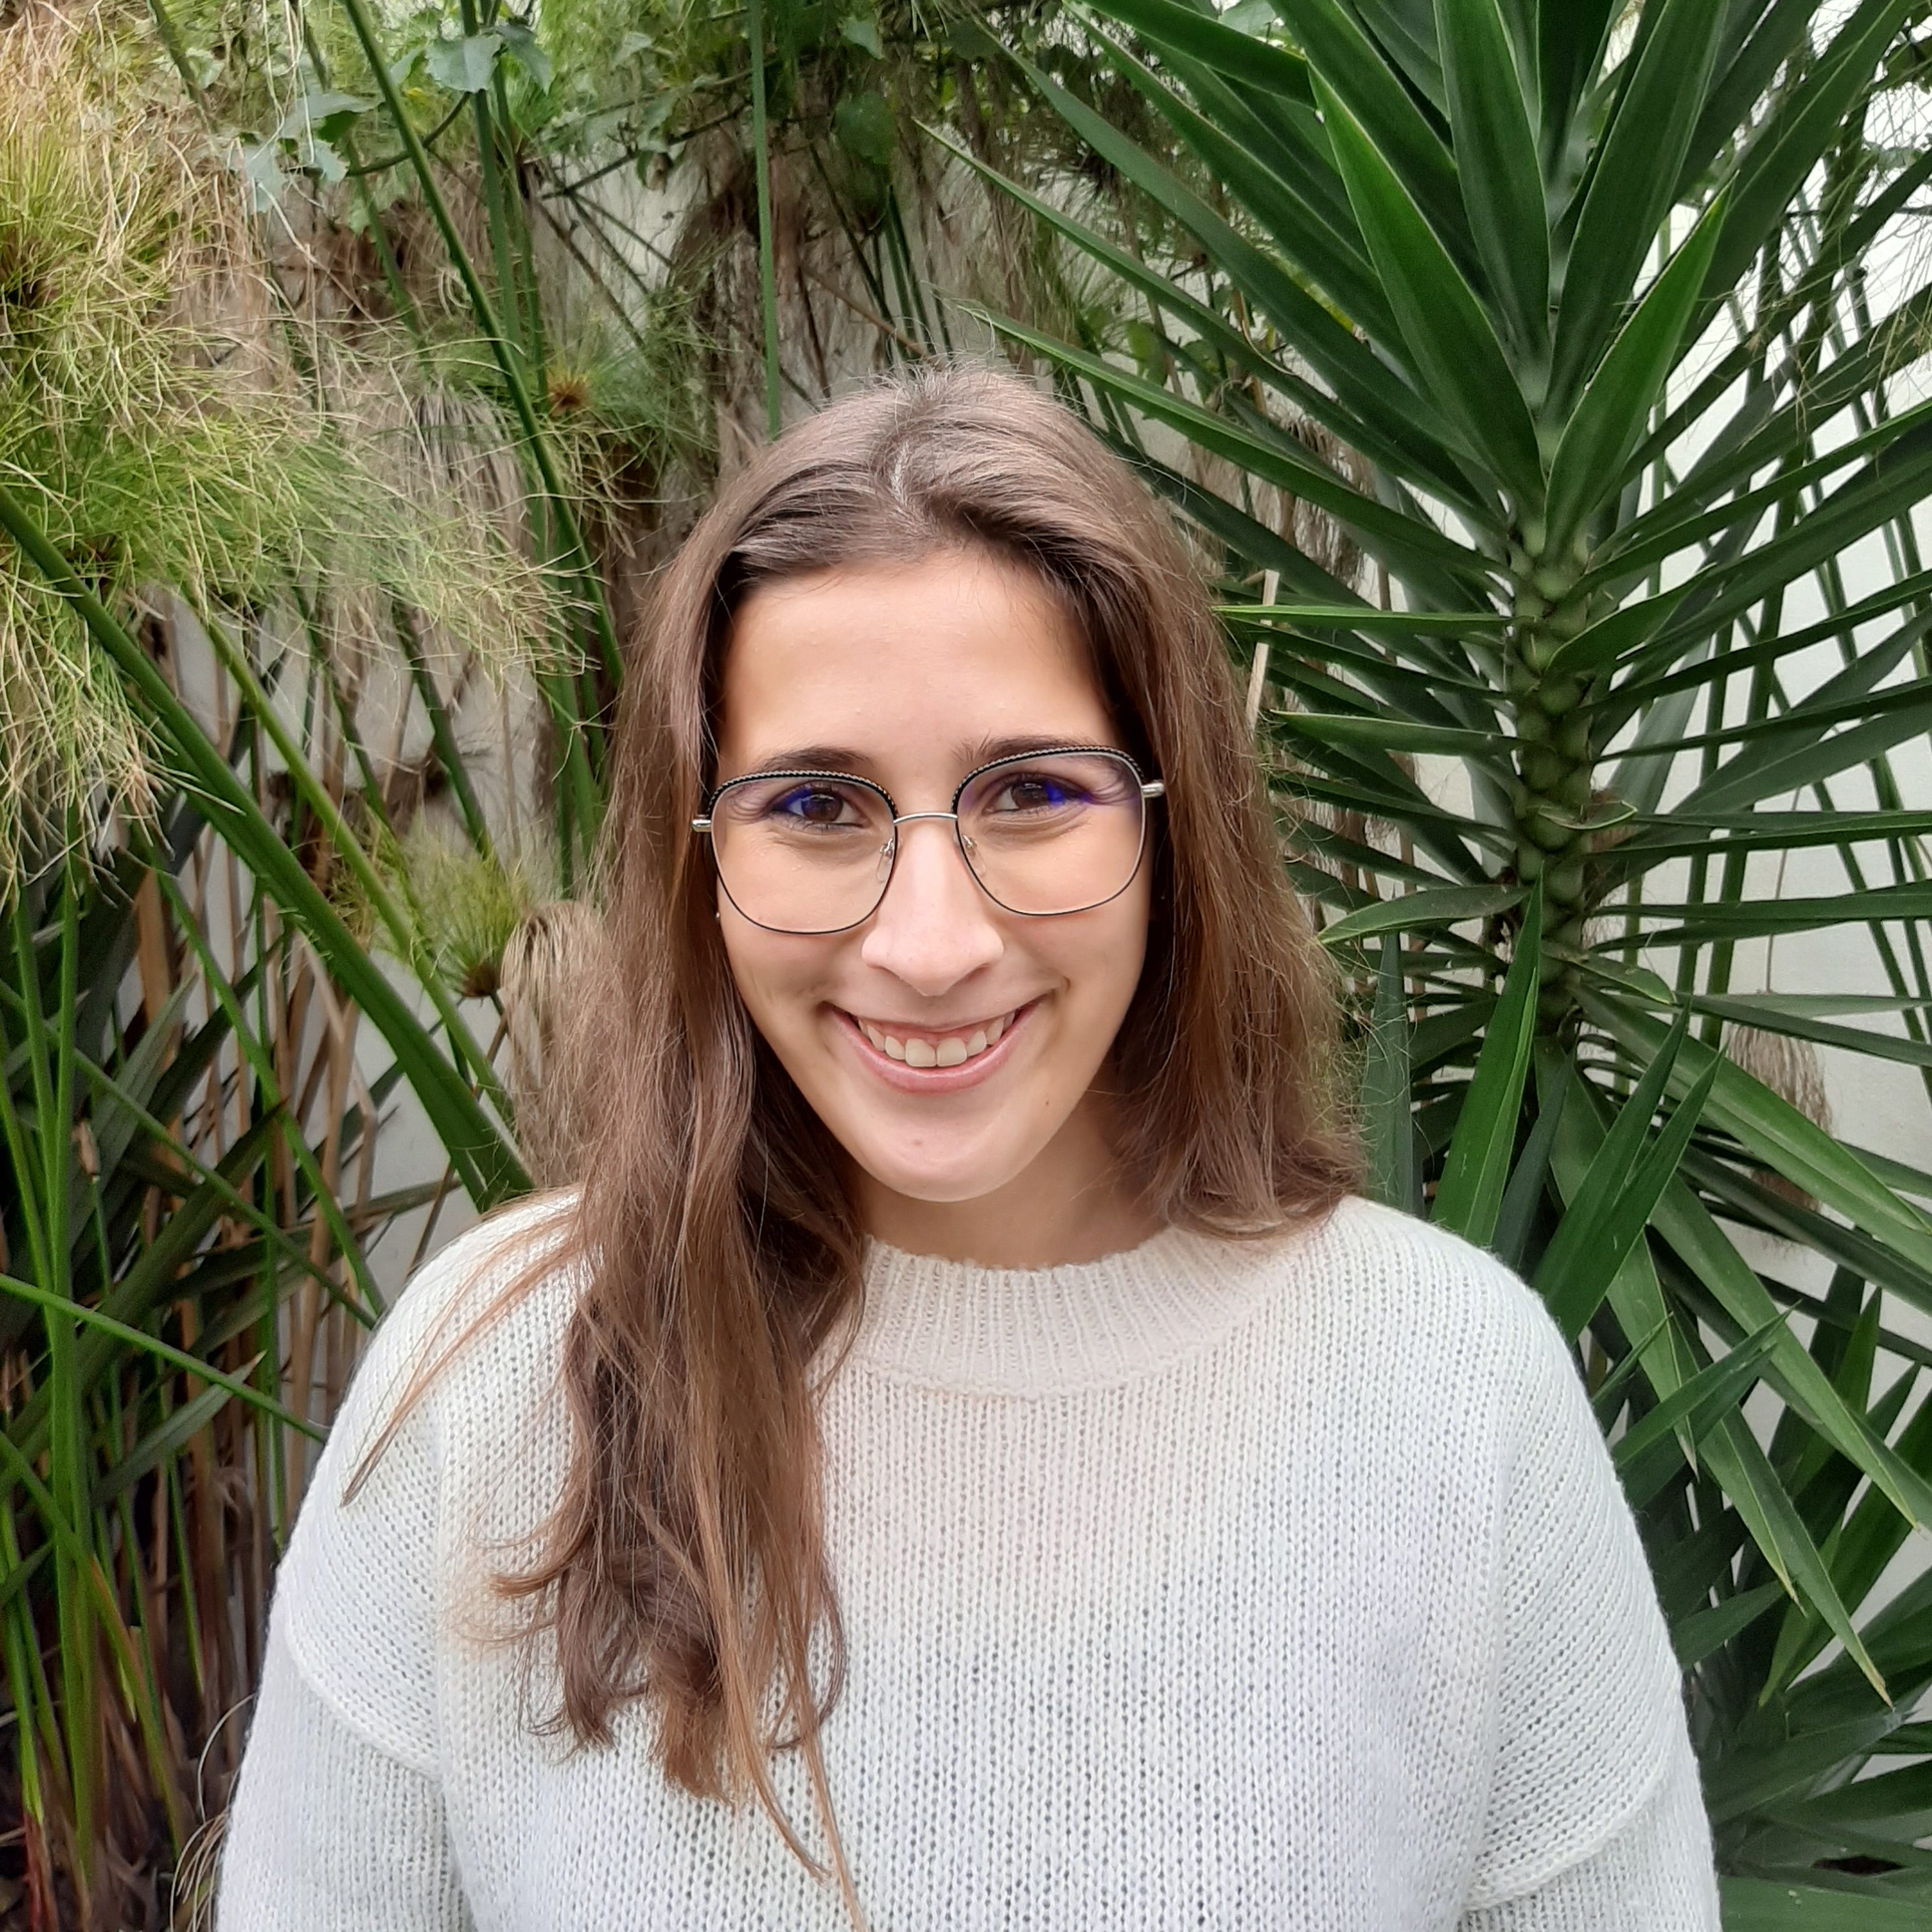 Laura Almeida